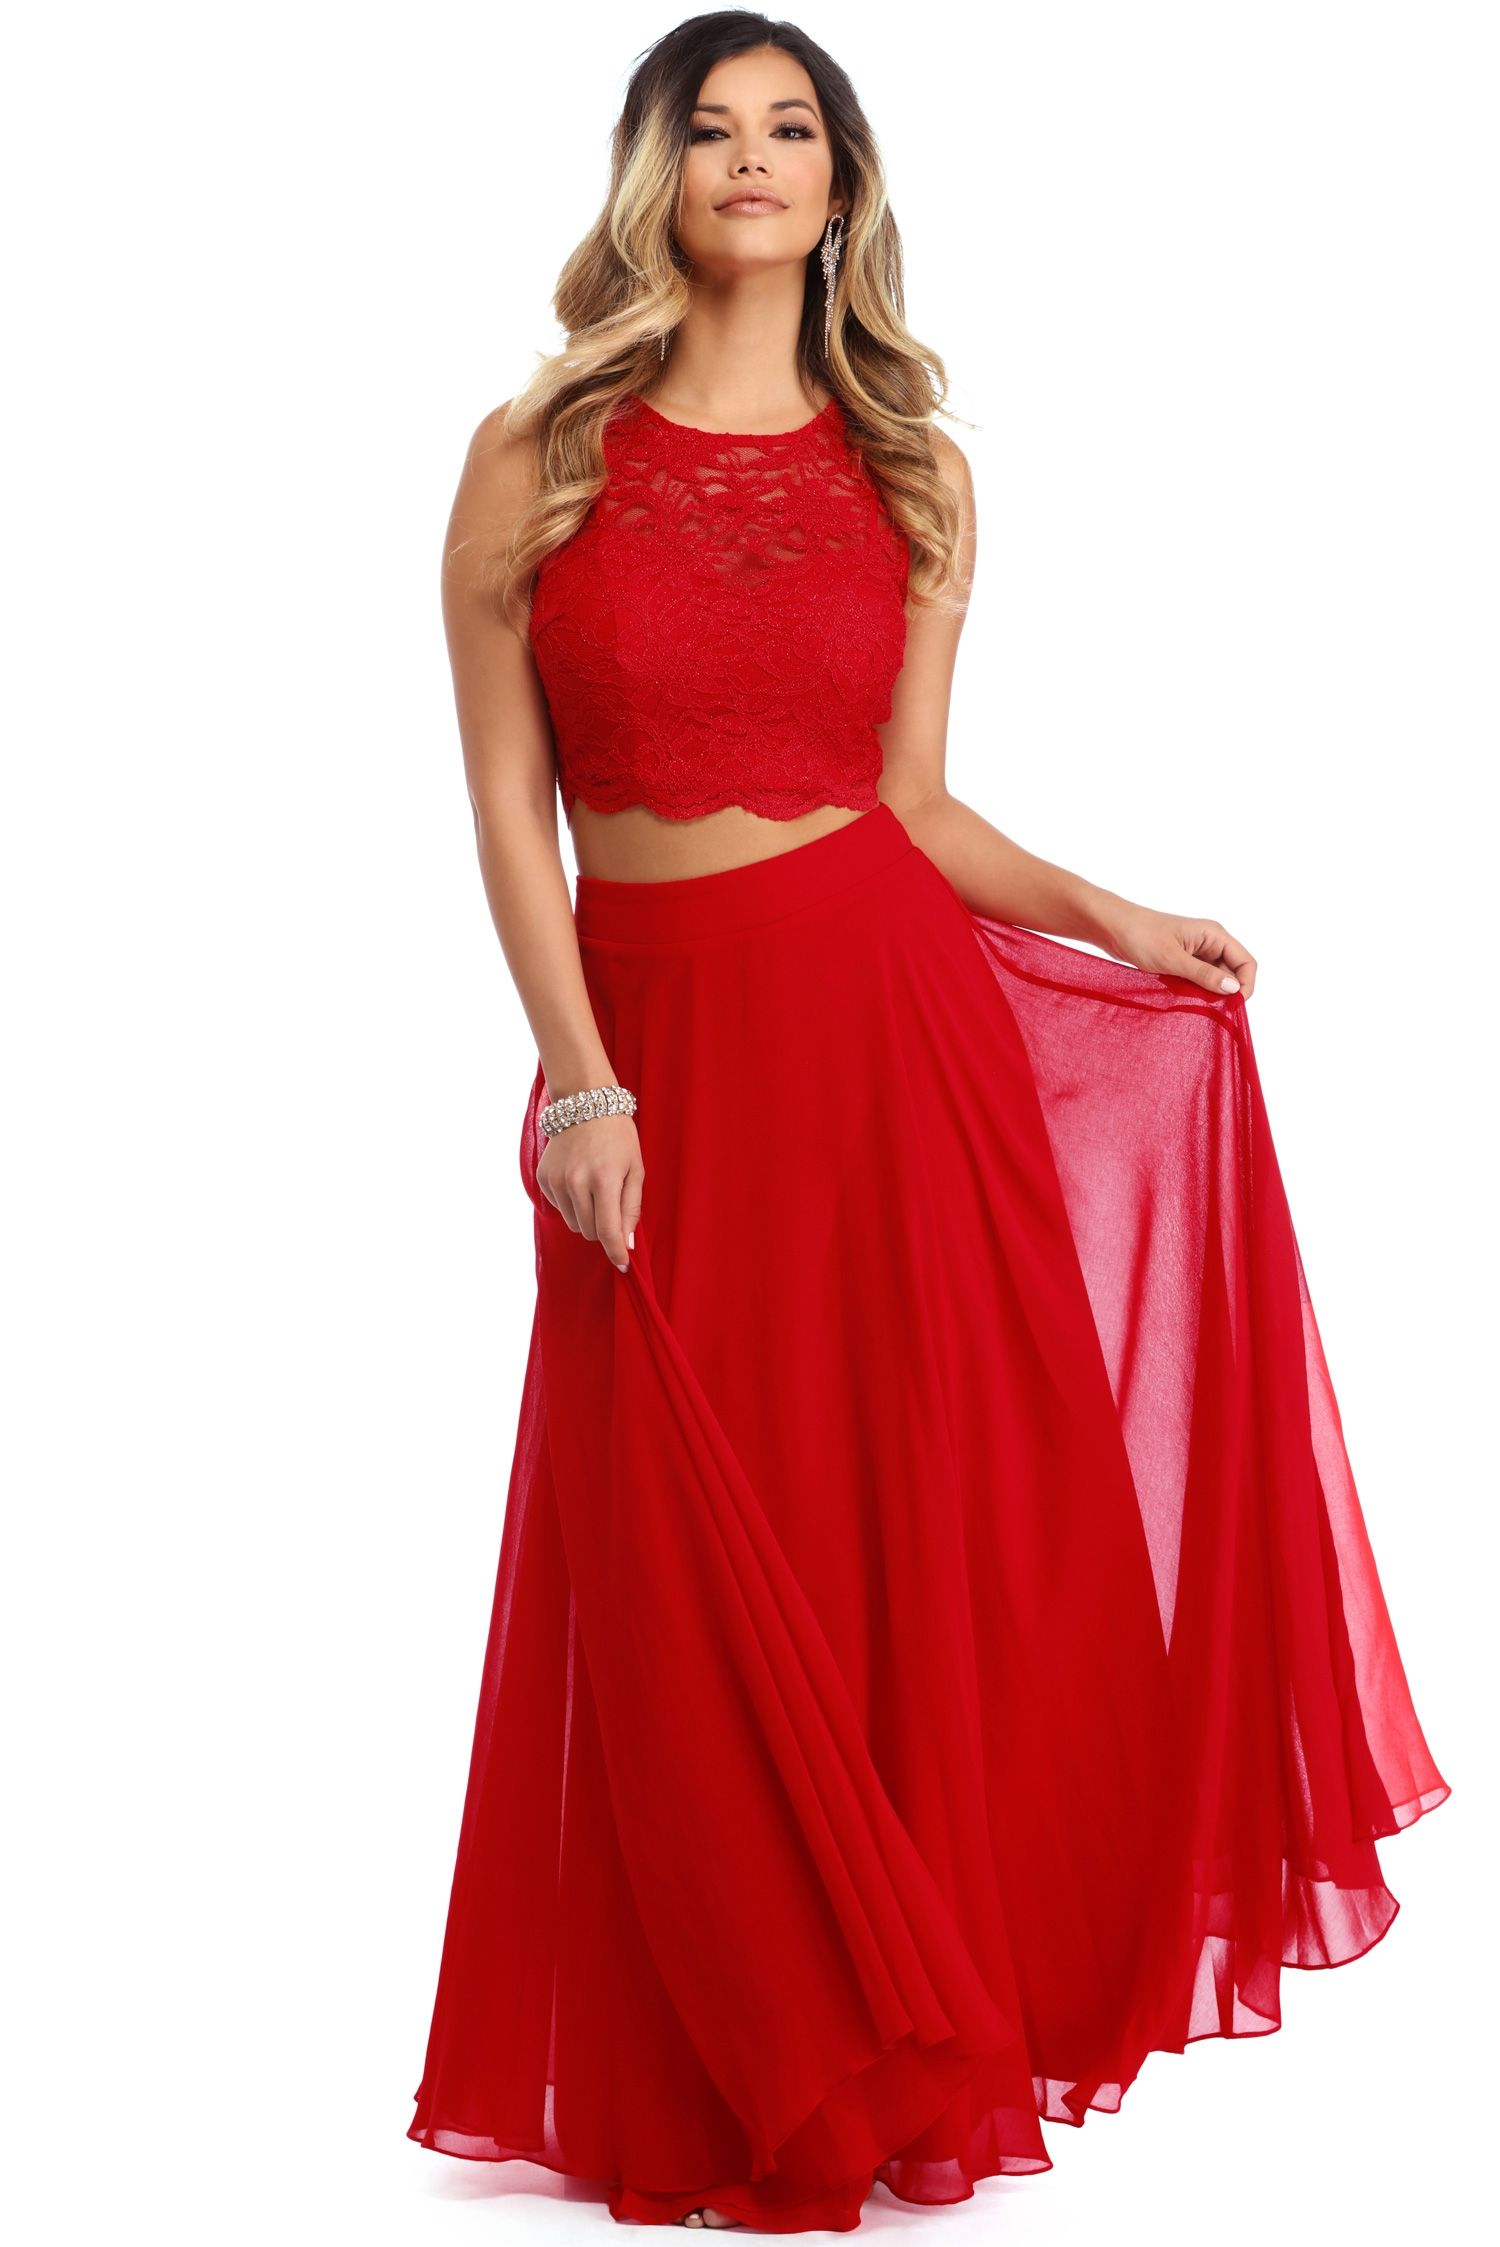 Danelle Red Vibes Two Piece Windsor Bridesmaid Dresses Club Dresses Dresses [ 2247 x 1500 Pixel ]